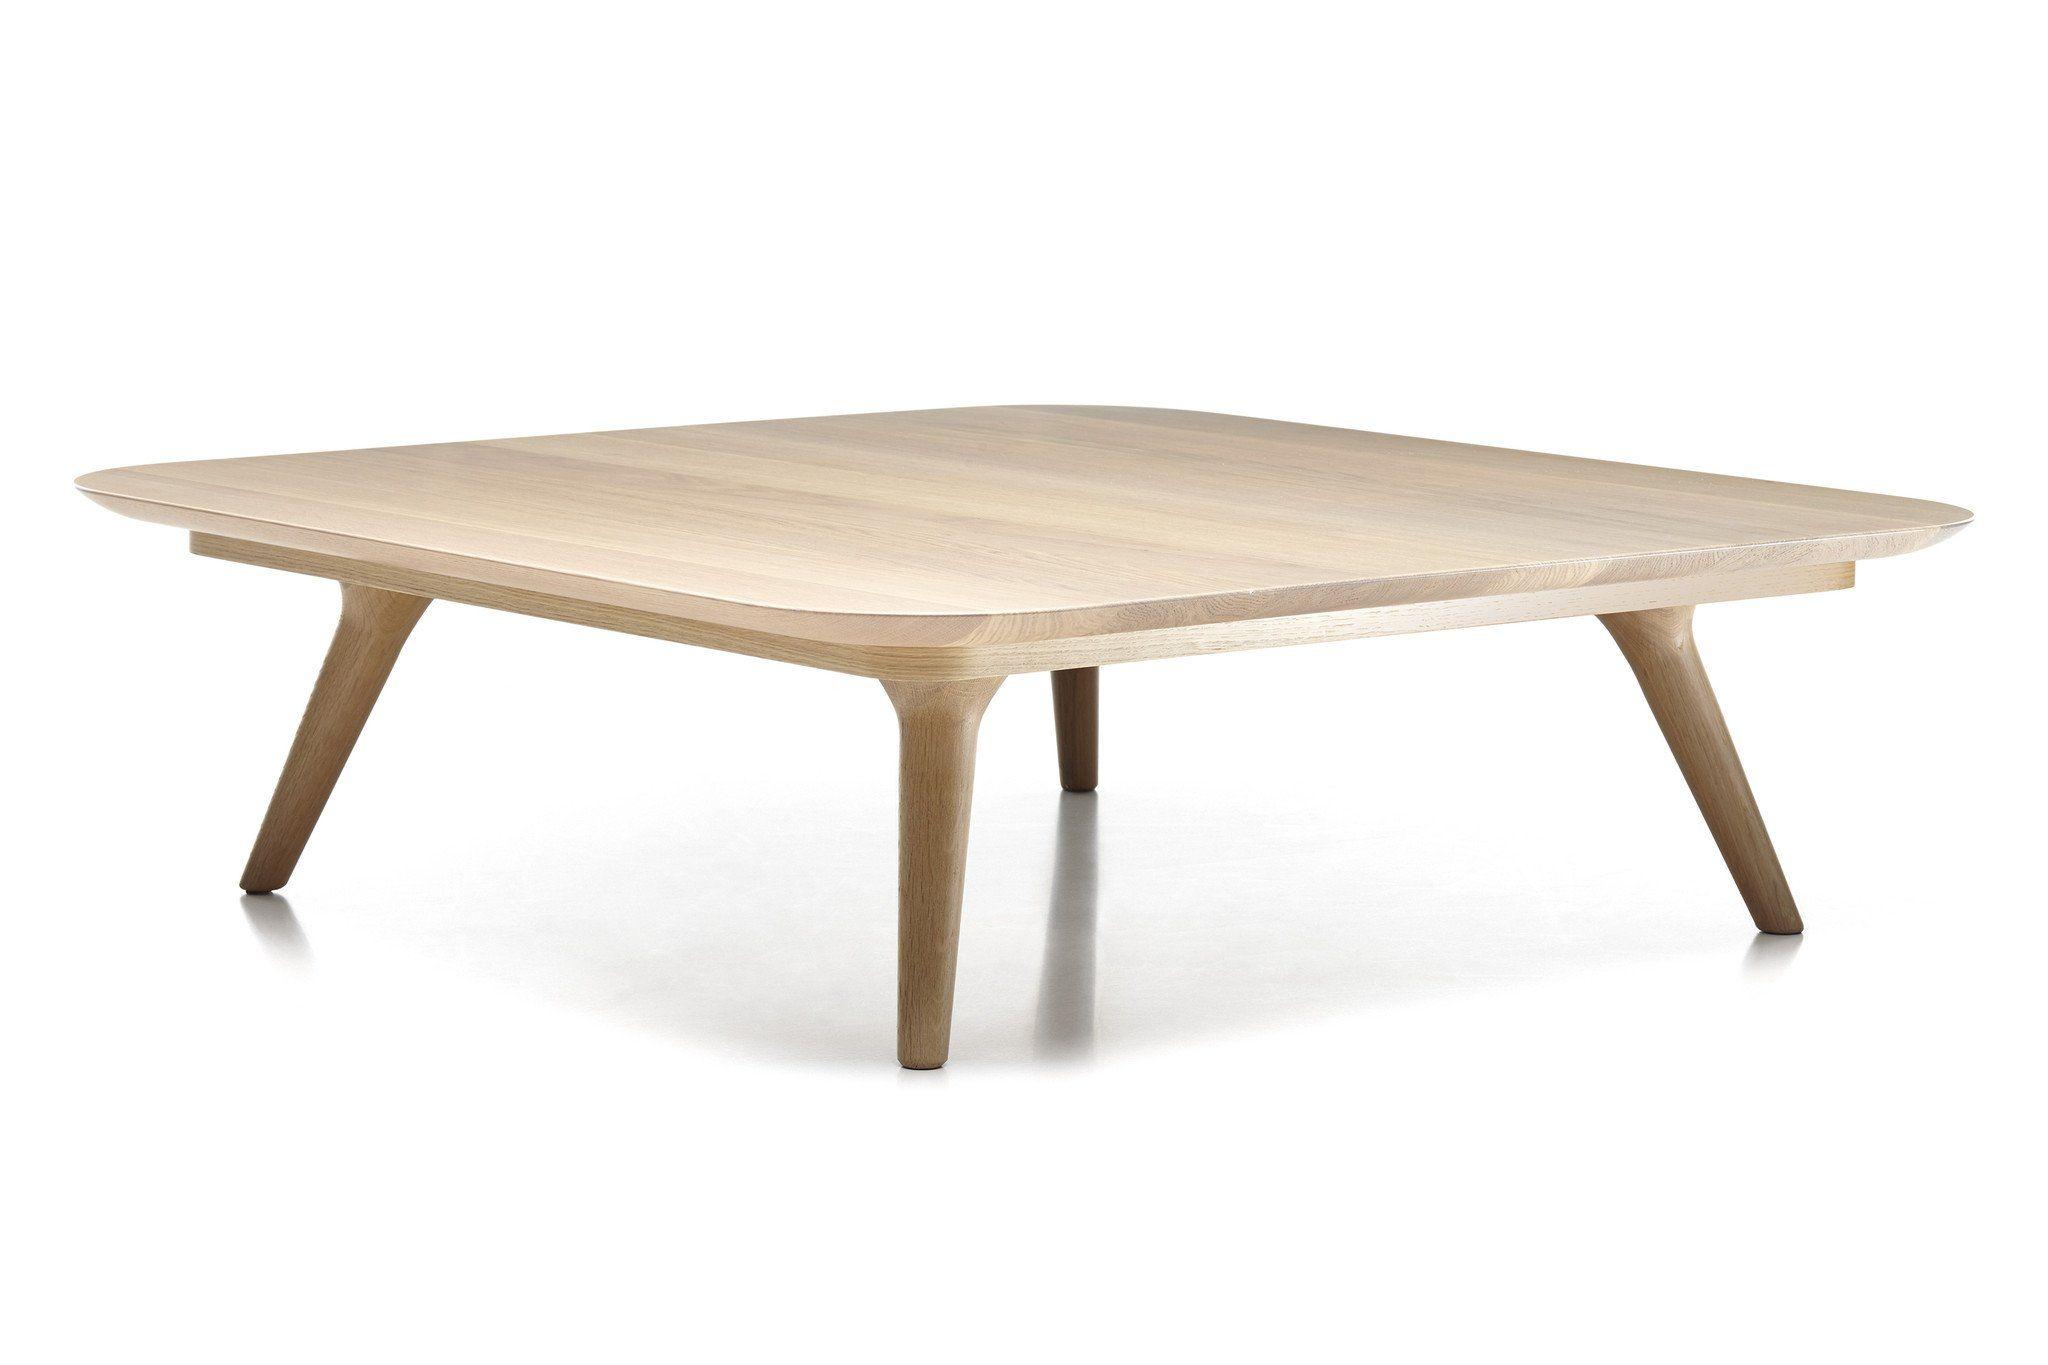 Zio Square Coffee Table Coffee Table Coffee Table Square Coffee Tables For Sale [ 1365 x 2048 Pixel ]